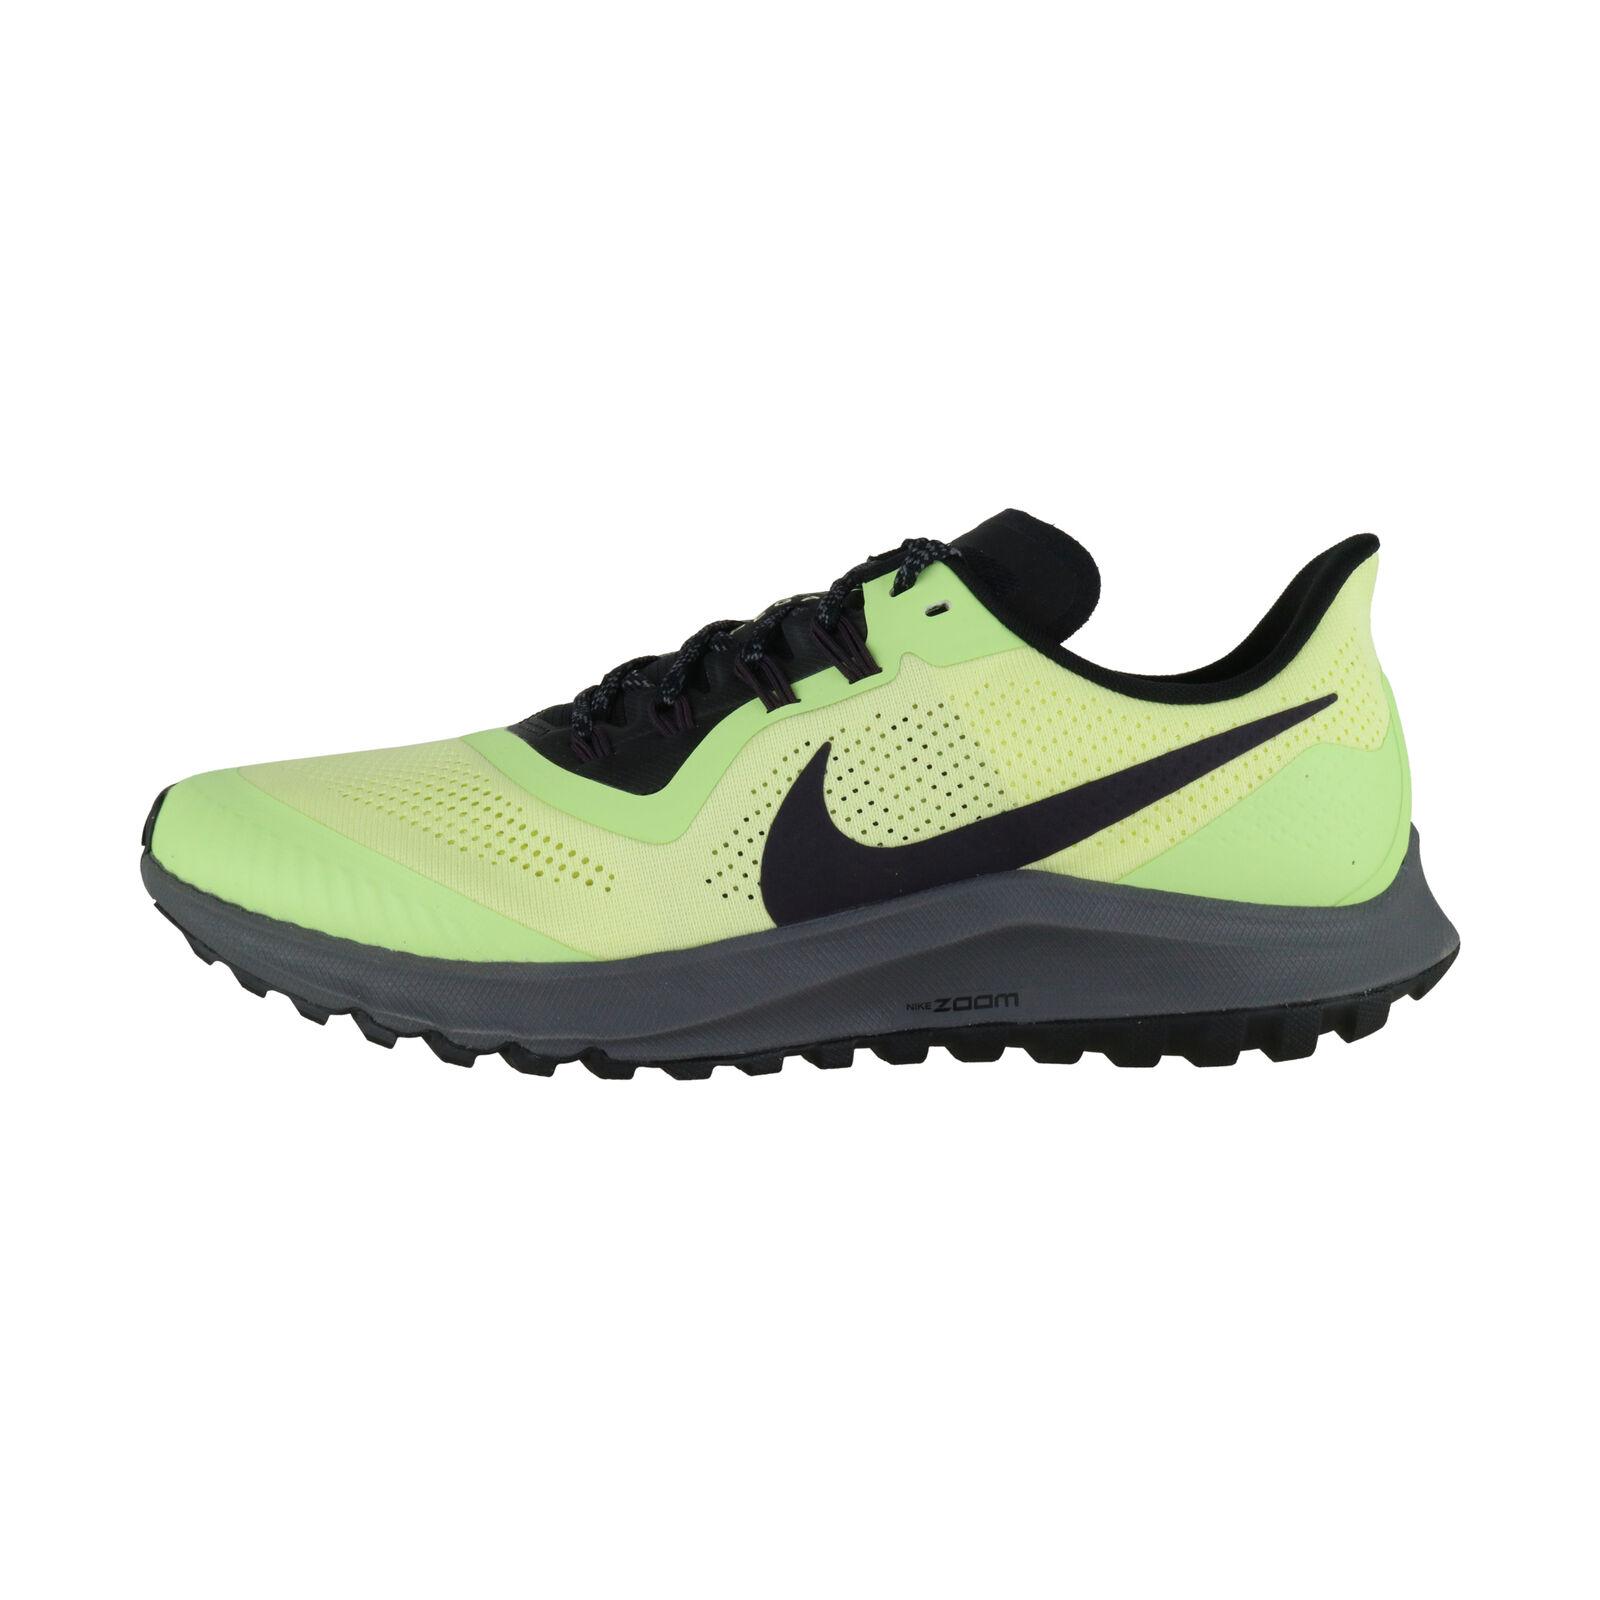 Detalles de Nike Air Zoom Pegasus 36 Trail verdegris AR5677 300 ver título original